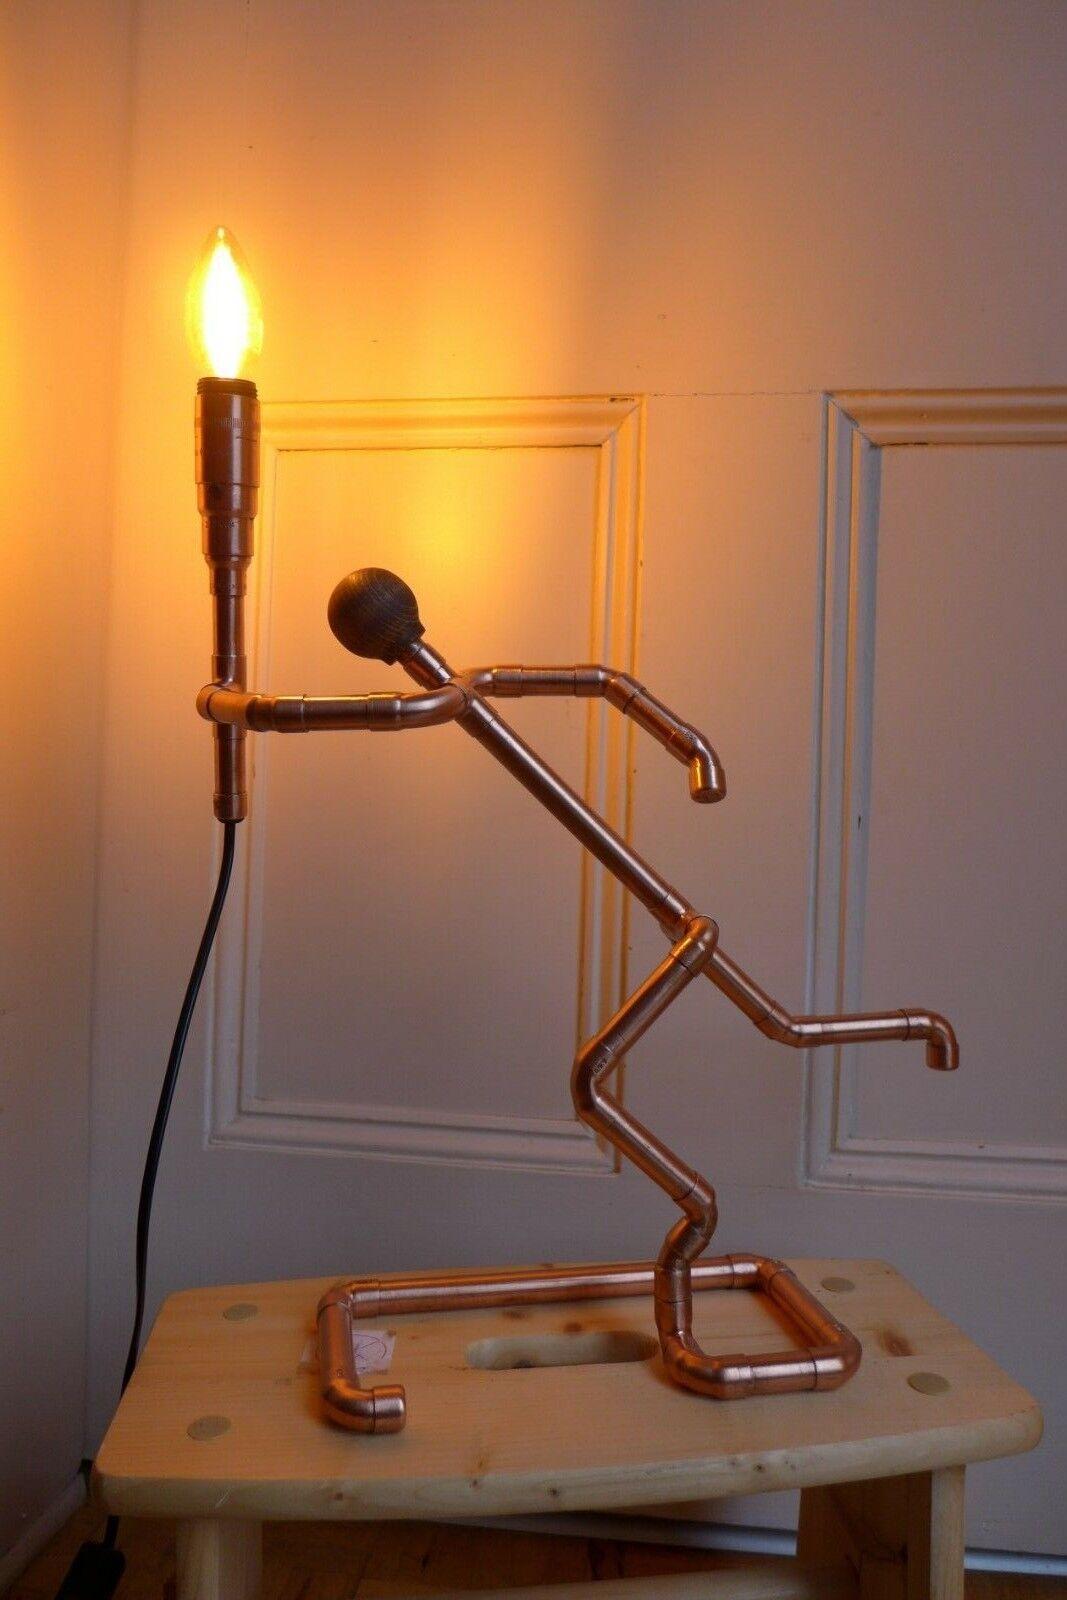 Copper man table lamp design handmade home cottage barn farm pub loft art HQ P3